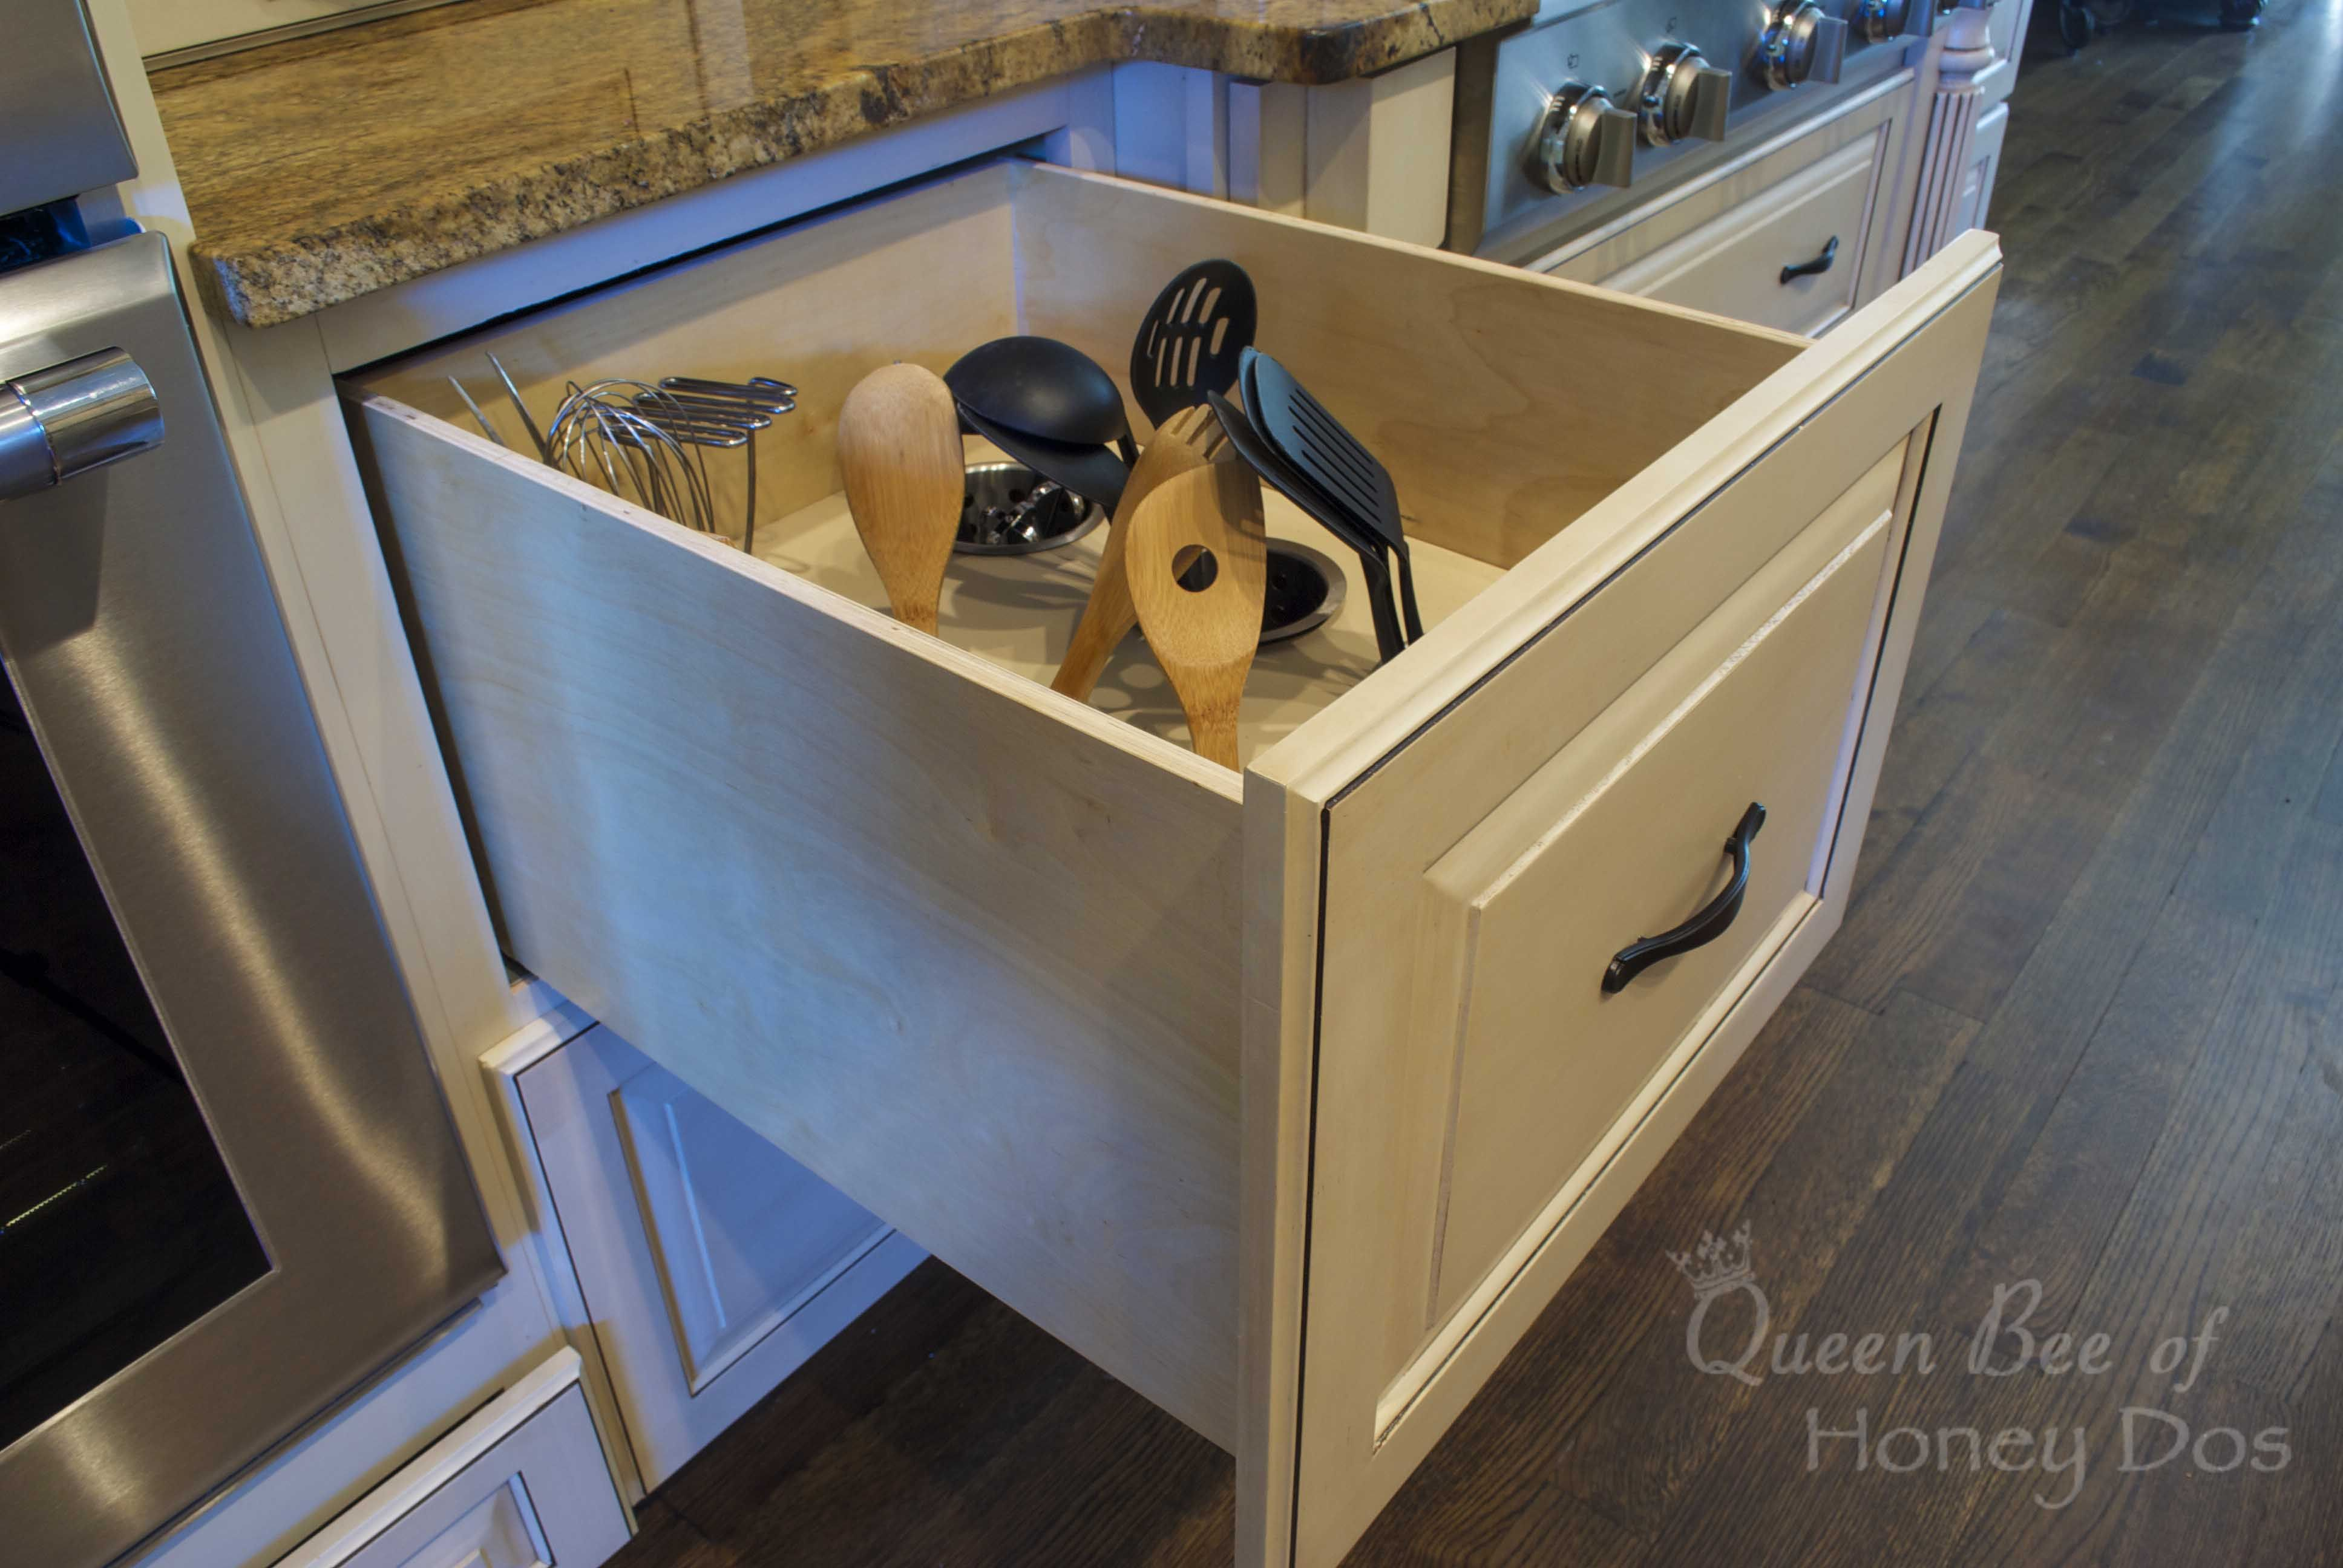 Diy Kitchen Utensil Drawer Organizer Upright Utensils Deep Drawer